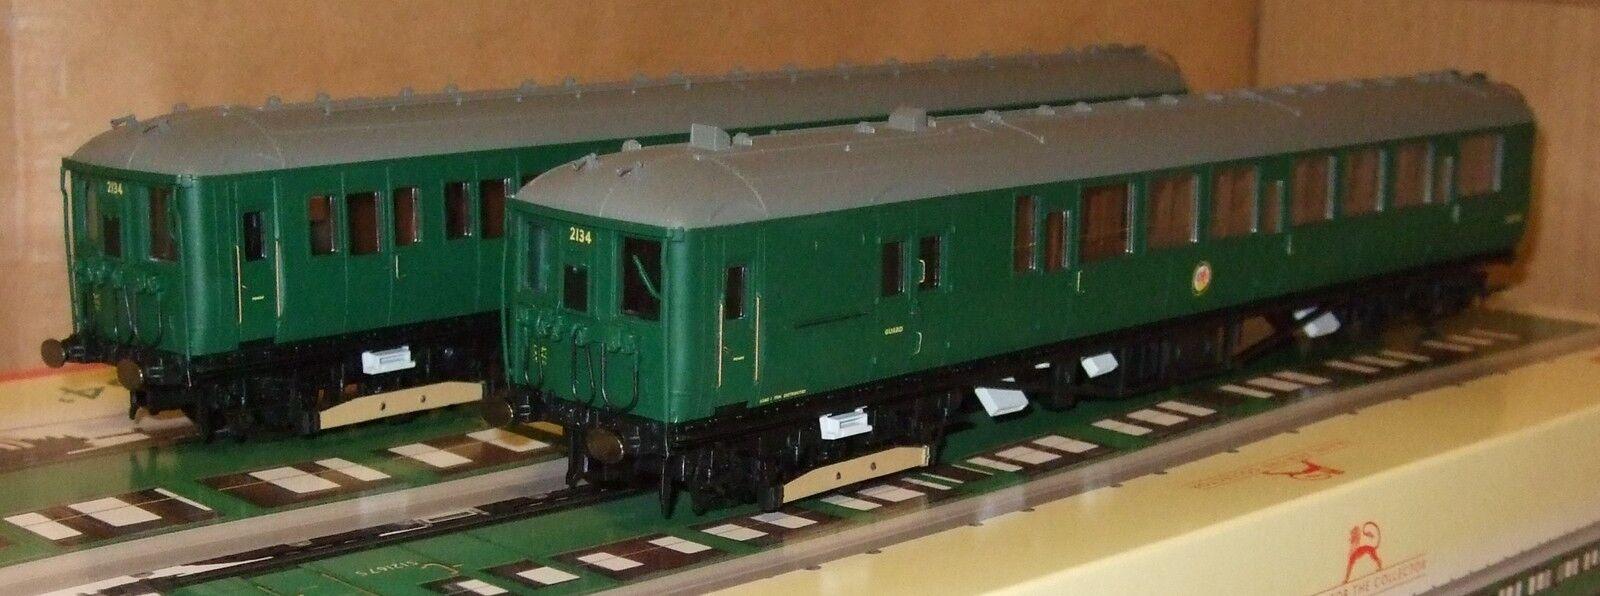 Hornby R3162 BR Class 401 2-BIL EMU No. 2134 BR verde livery**NEW**